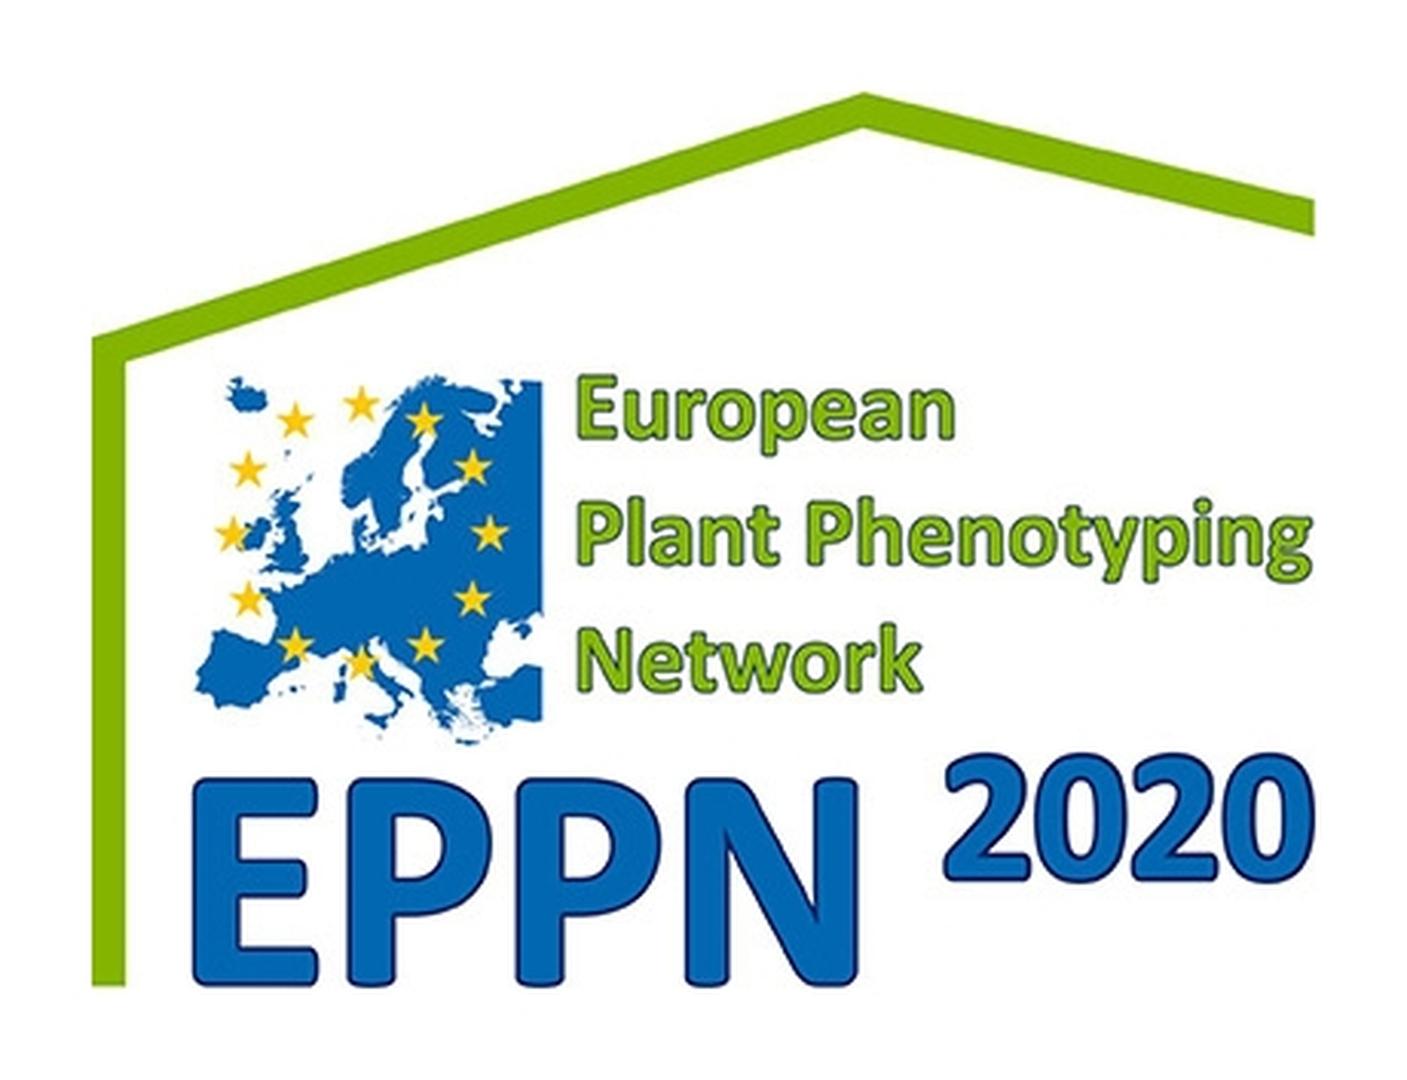 eppn2020-logo